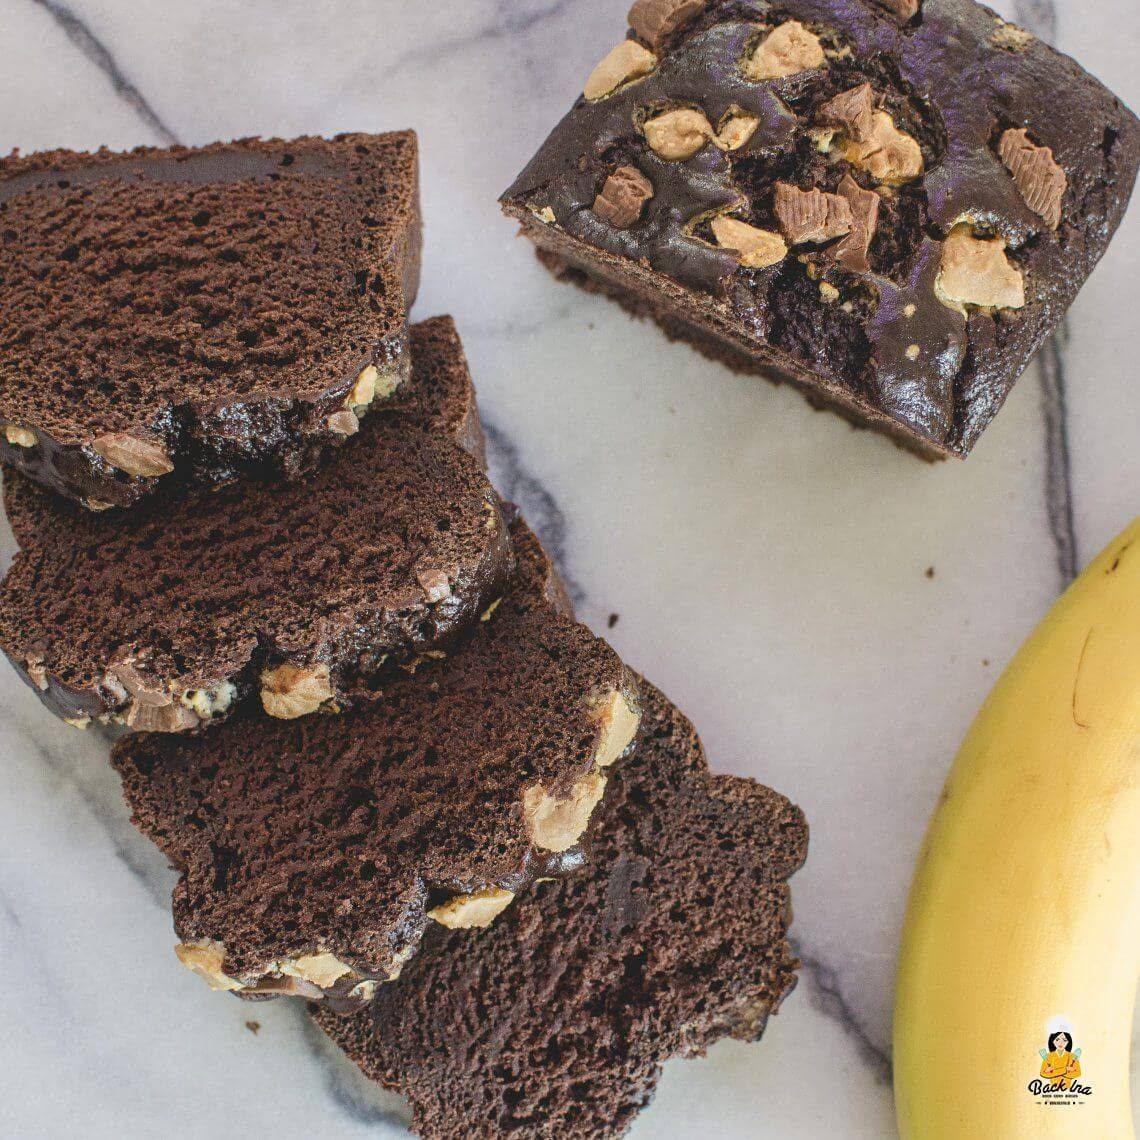 Saftiges Schoko Bananenbrot Ohne Zucker Weizen Und Fett Bananenbrot Ohne Zucker Schokoladen Bananenbrot Bananen Brot